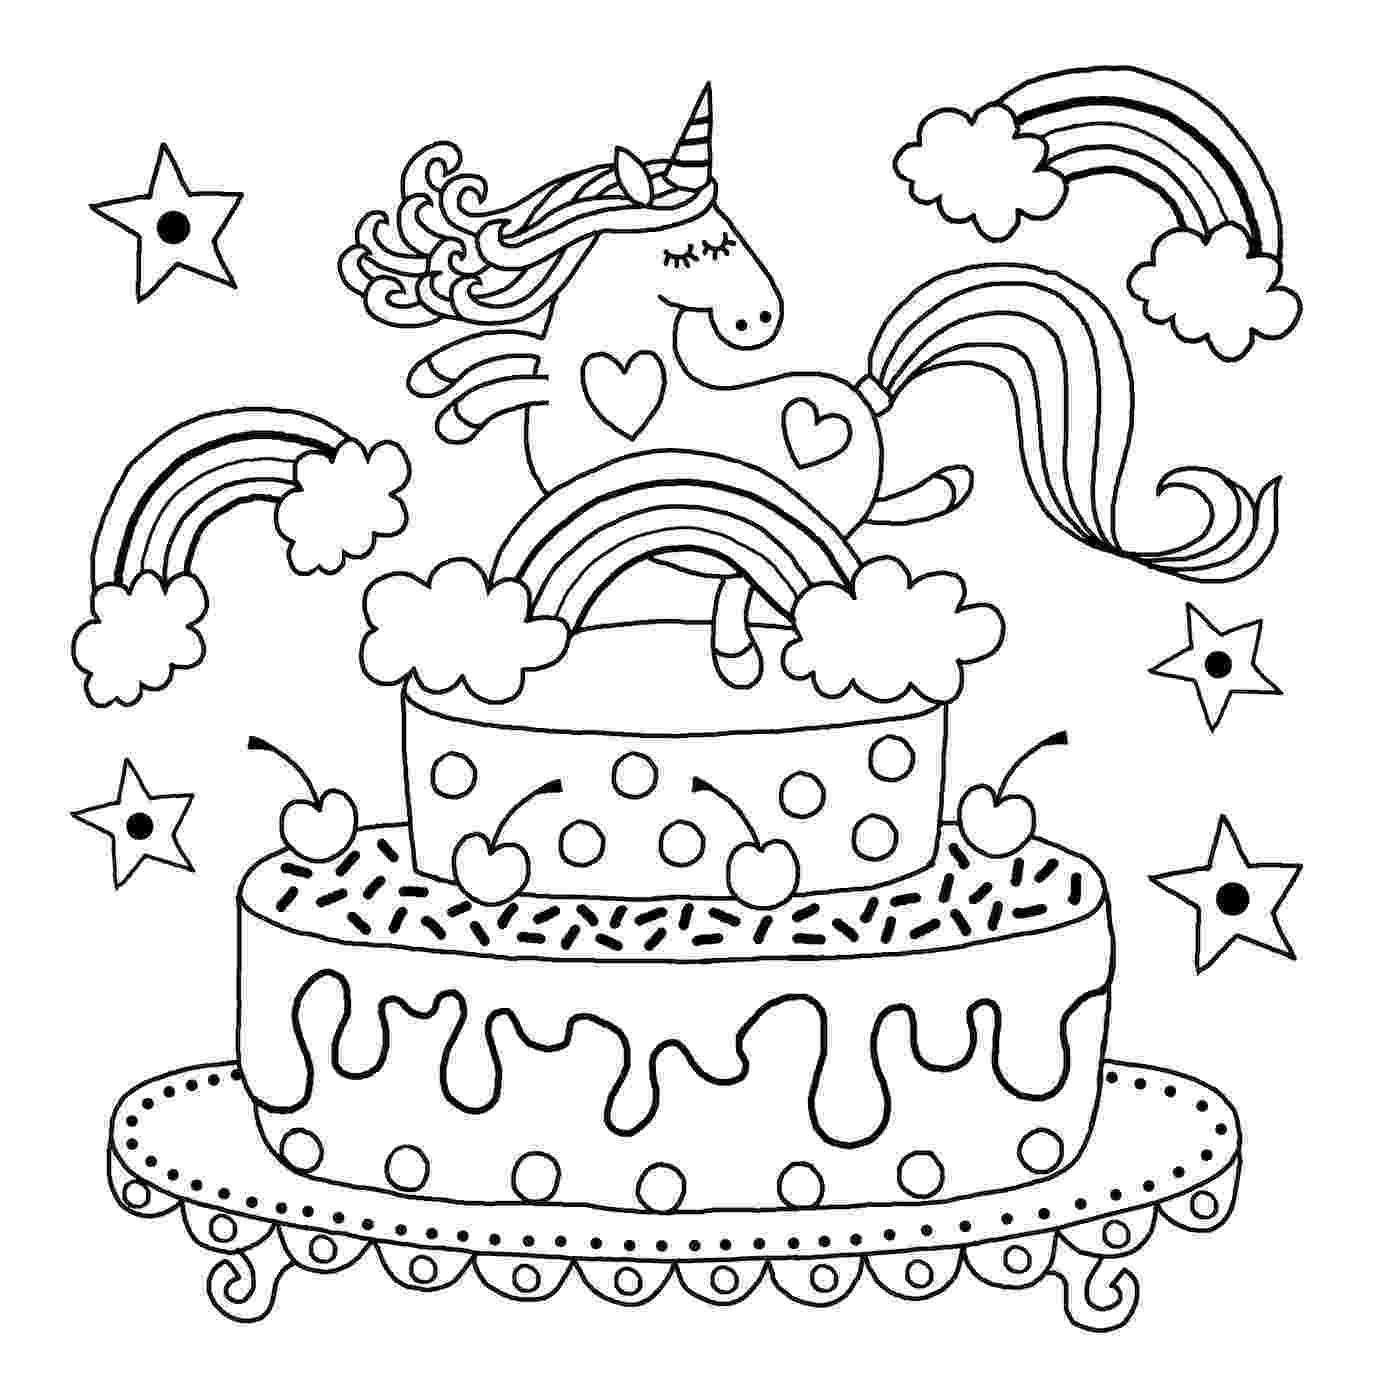 printable unicorn unicorn color pages for kids loving printable printable unicorn